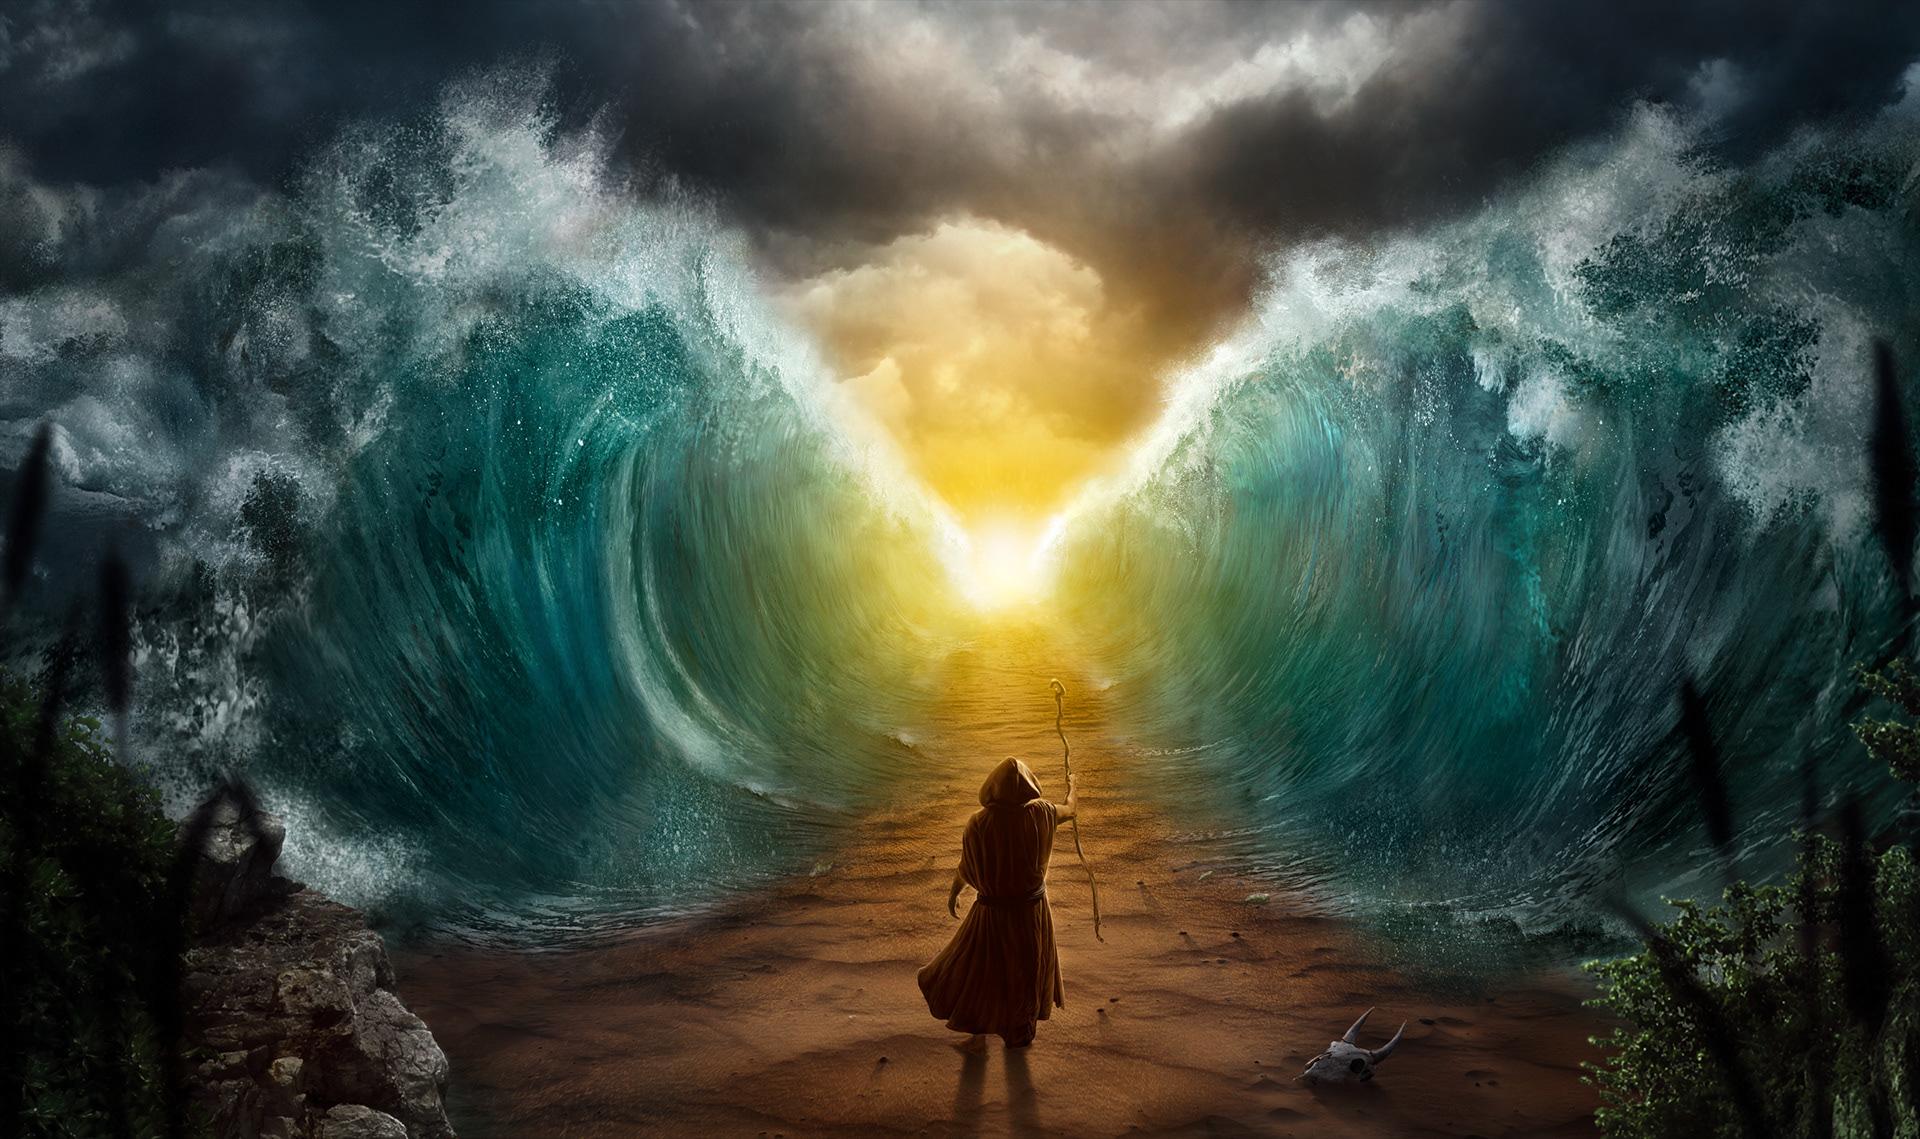 Rüdiger Lauktien - Moses splits the sea